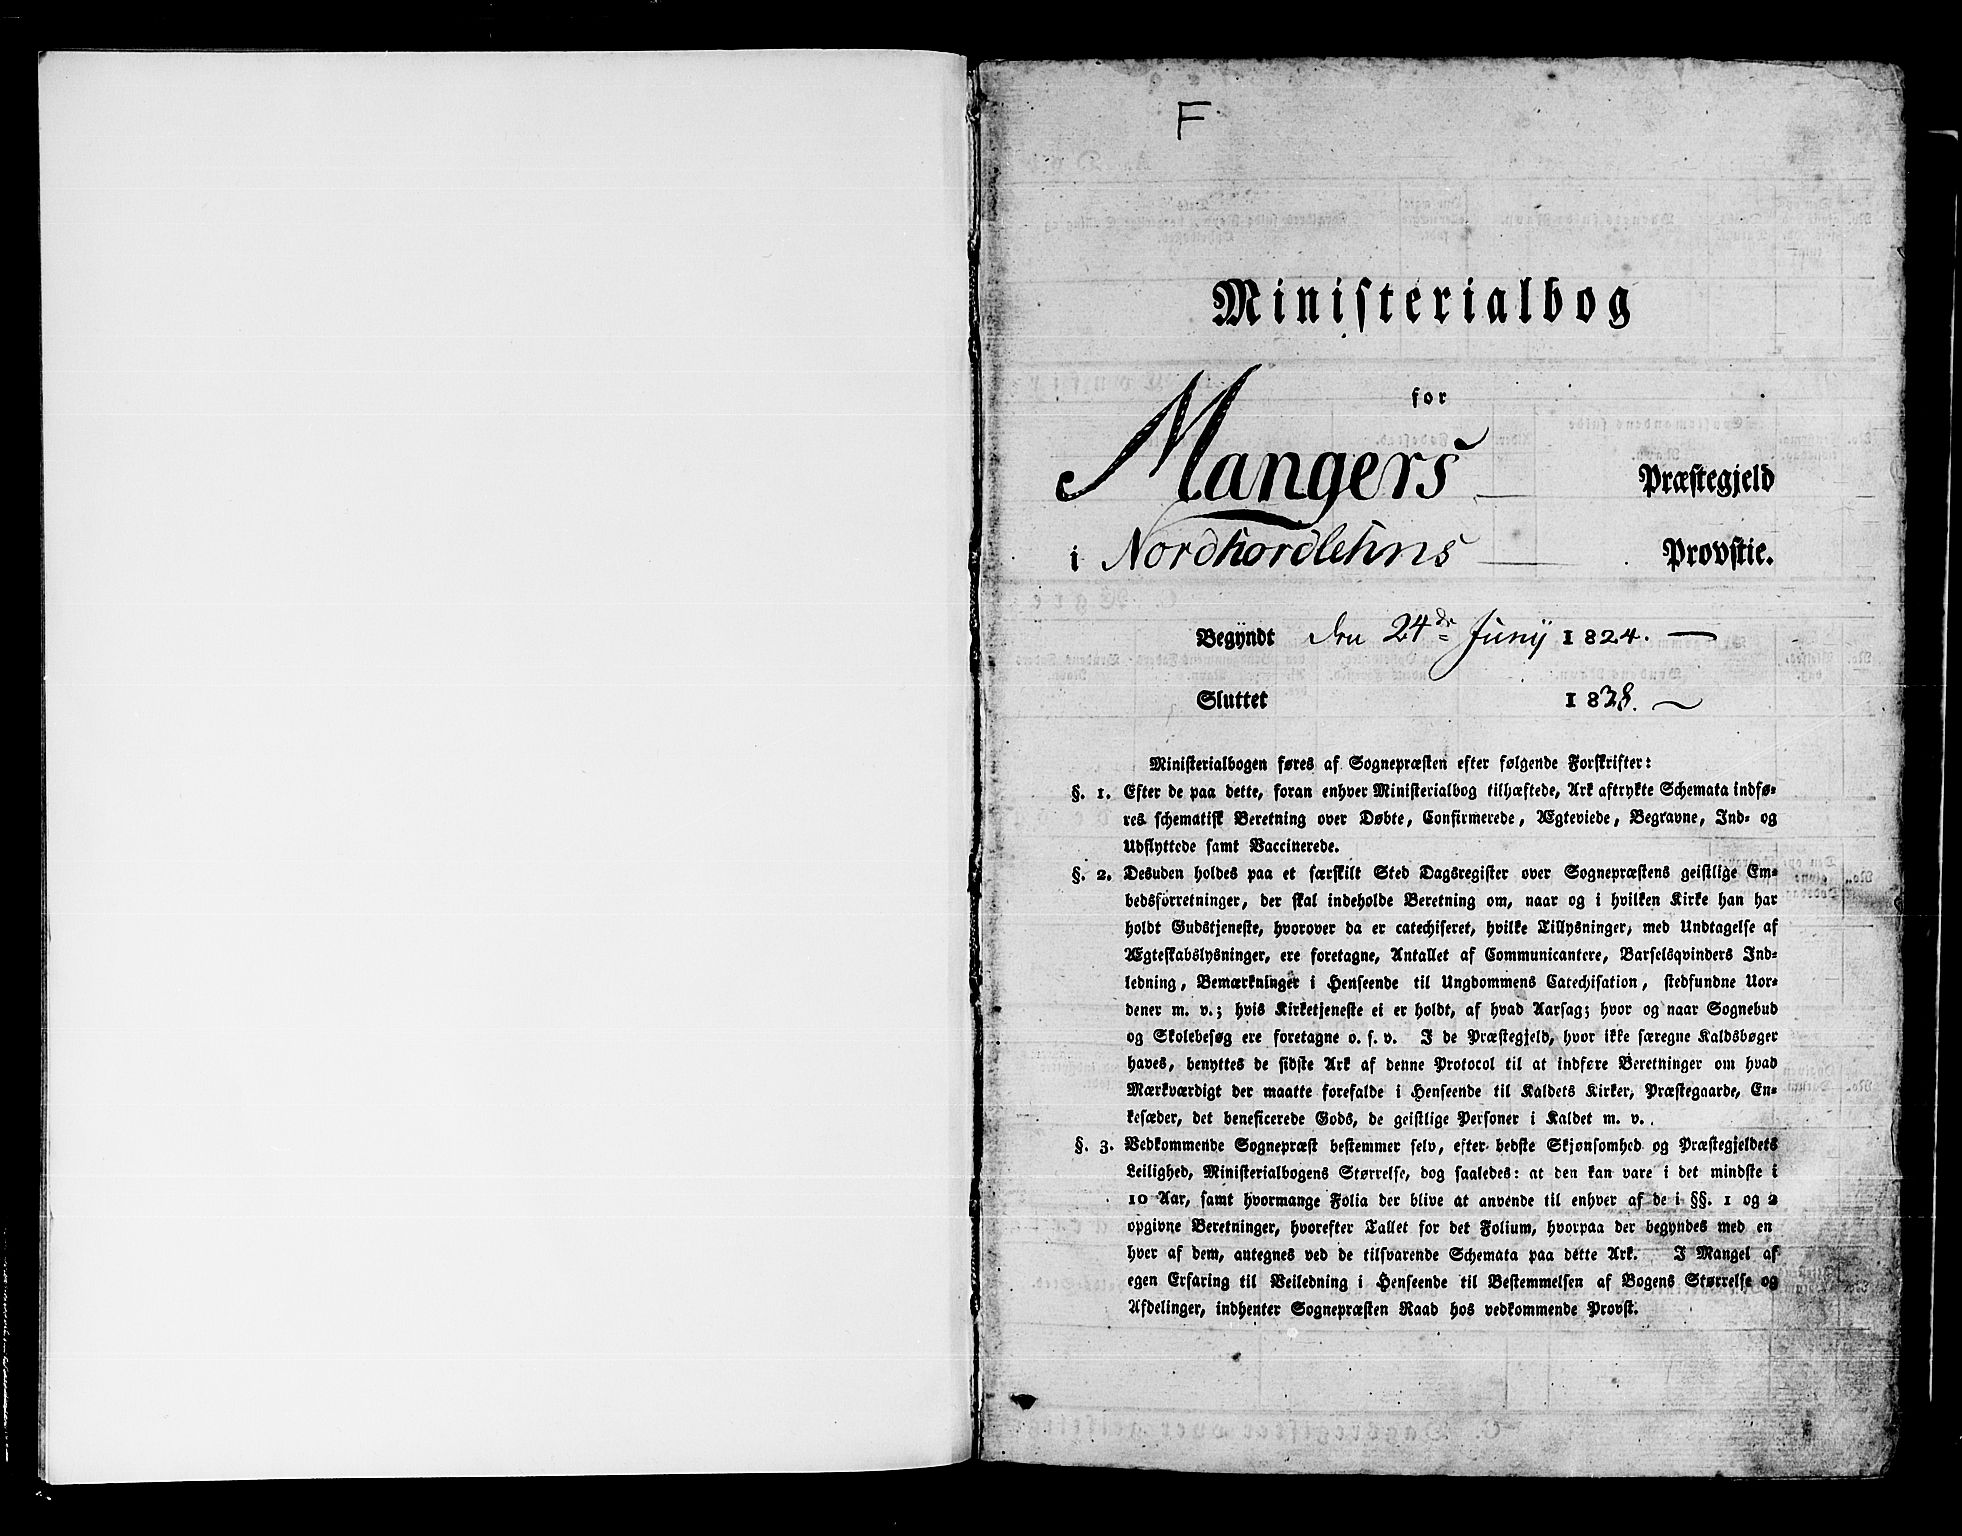 SAB, Manger sokneprestembete, H/Haa: Ministerialbok nr. A 4, 1824-1838